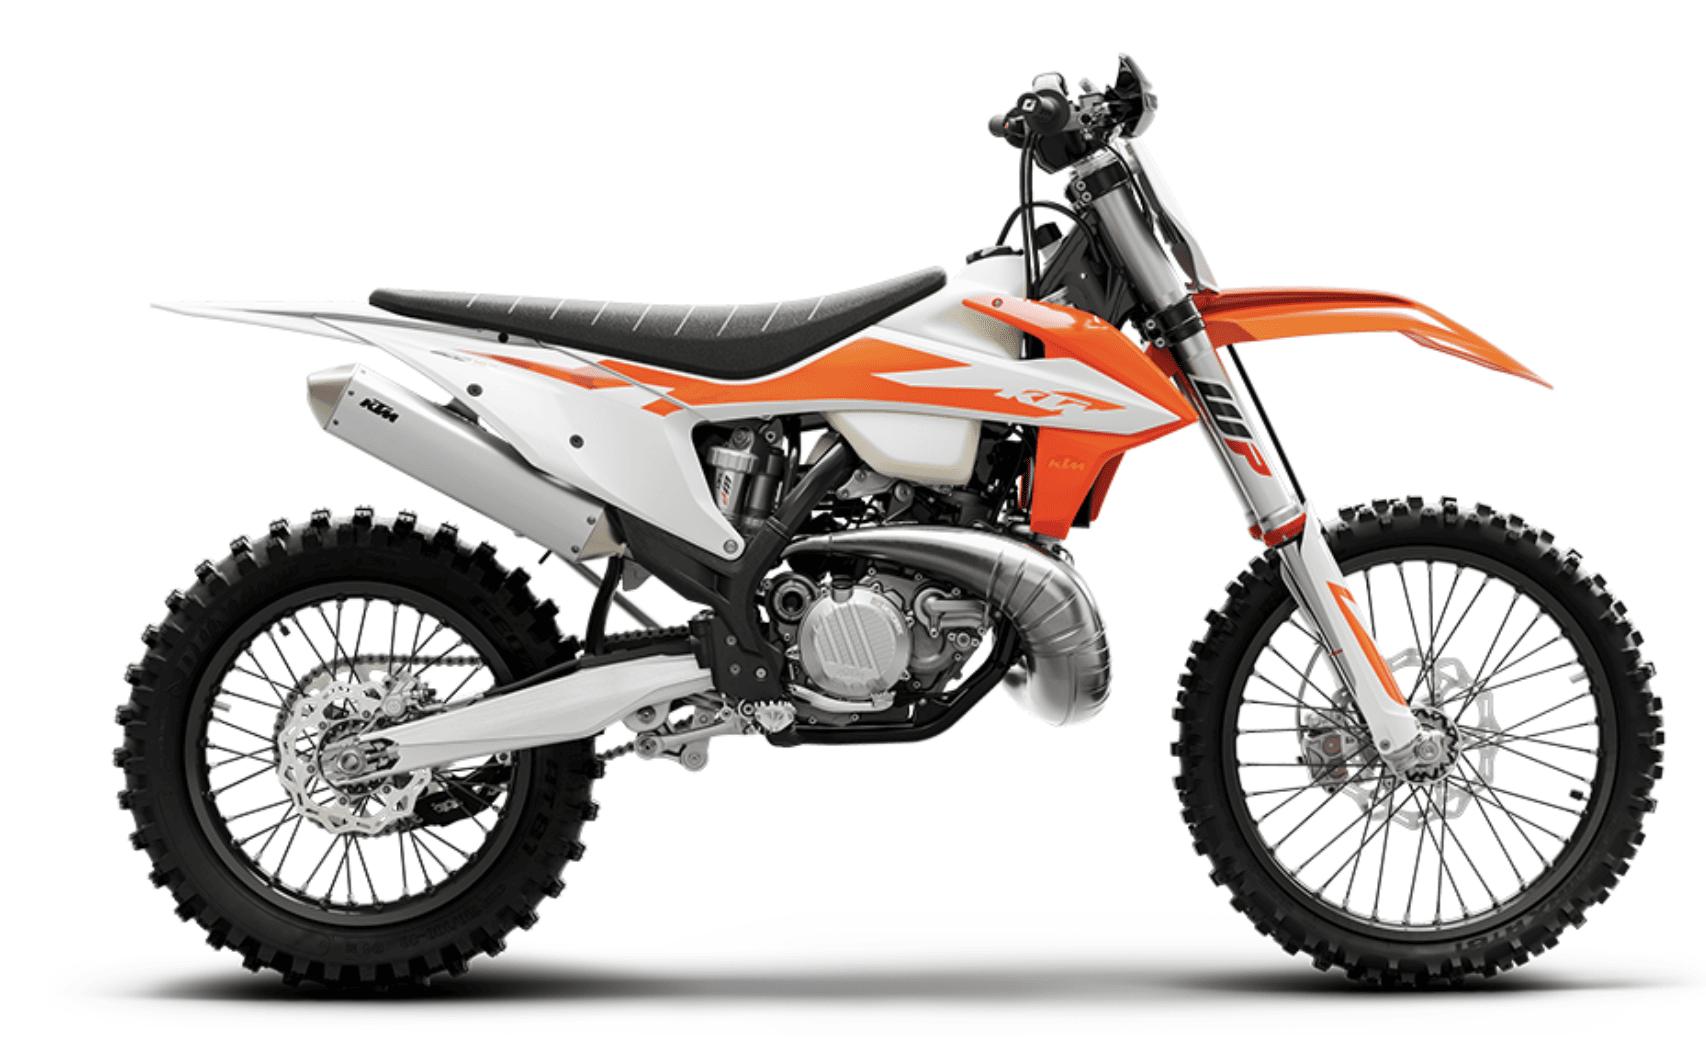 2020 KTM 300 XC TPI dirt bike